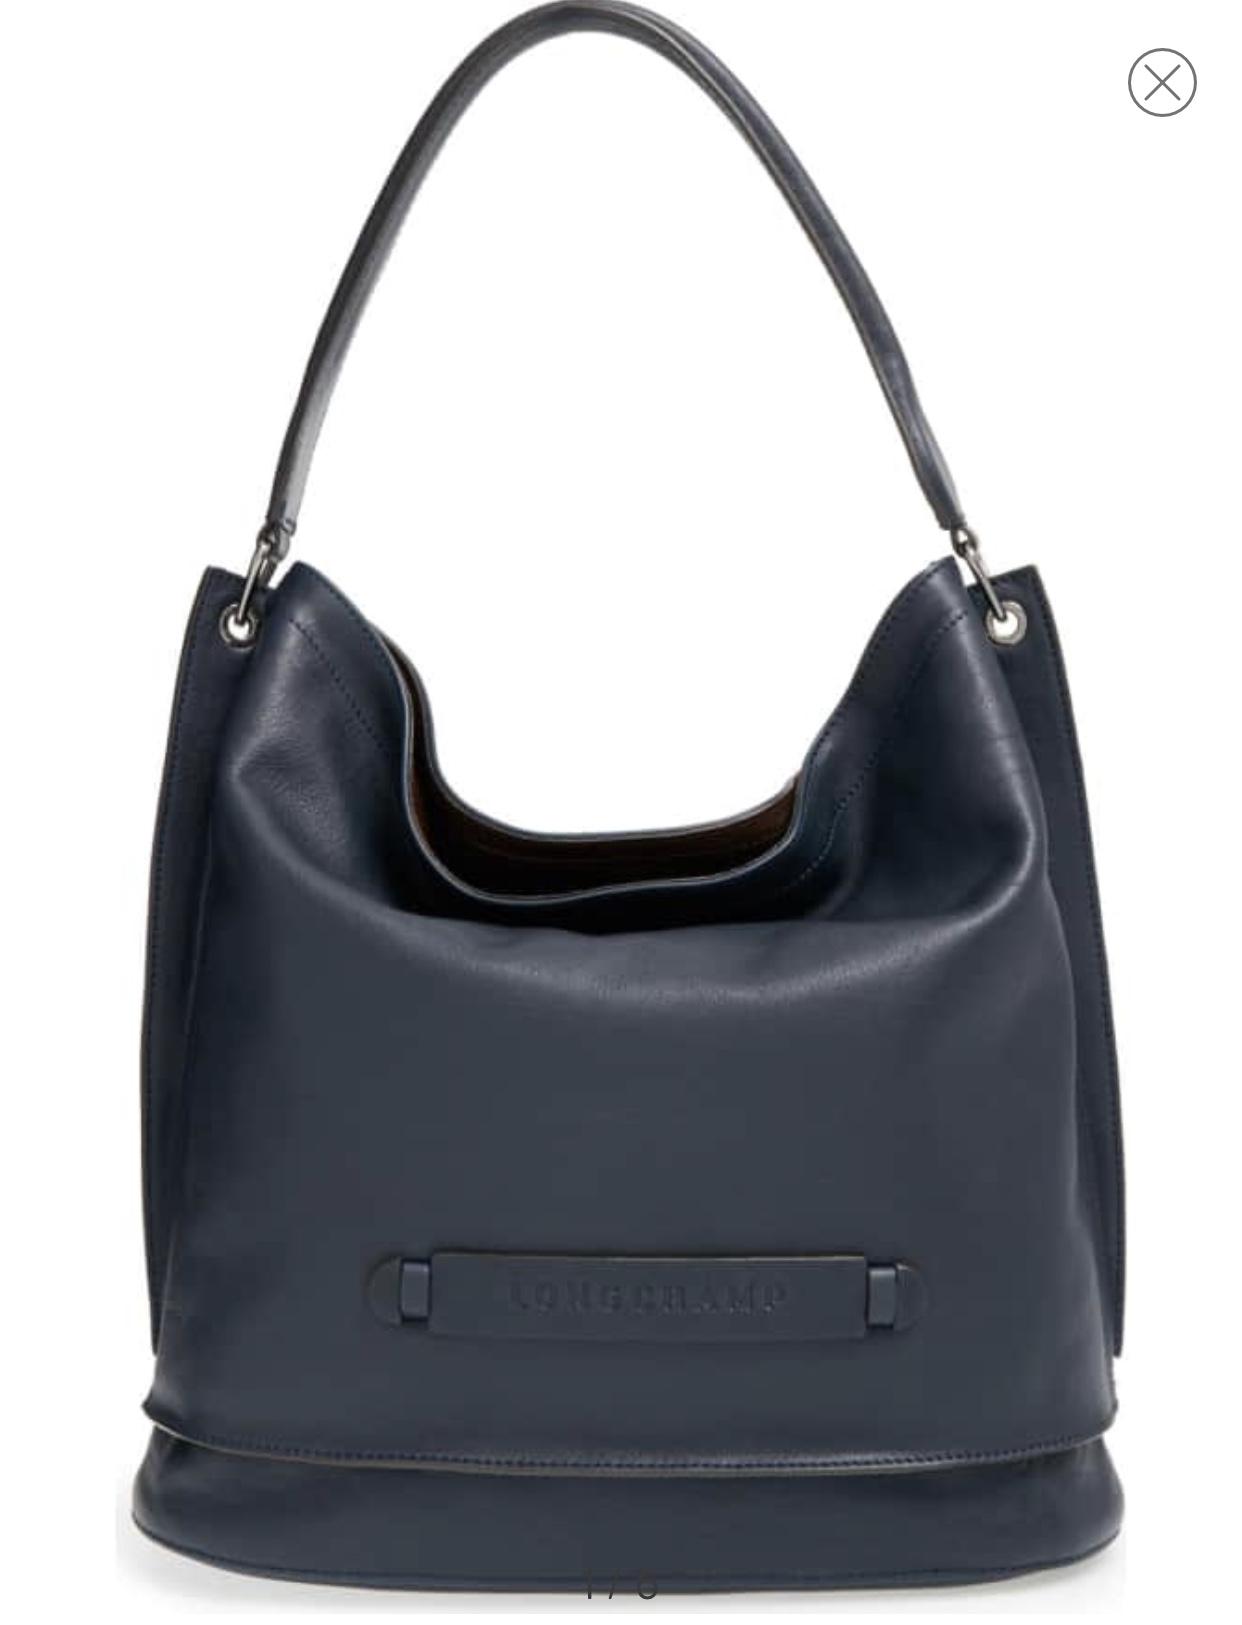 Longchamp 3D Leather Hobo- Midnight Blue